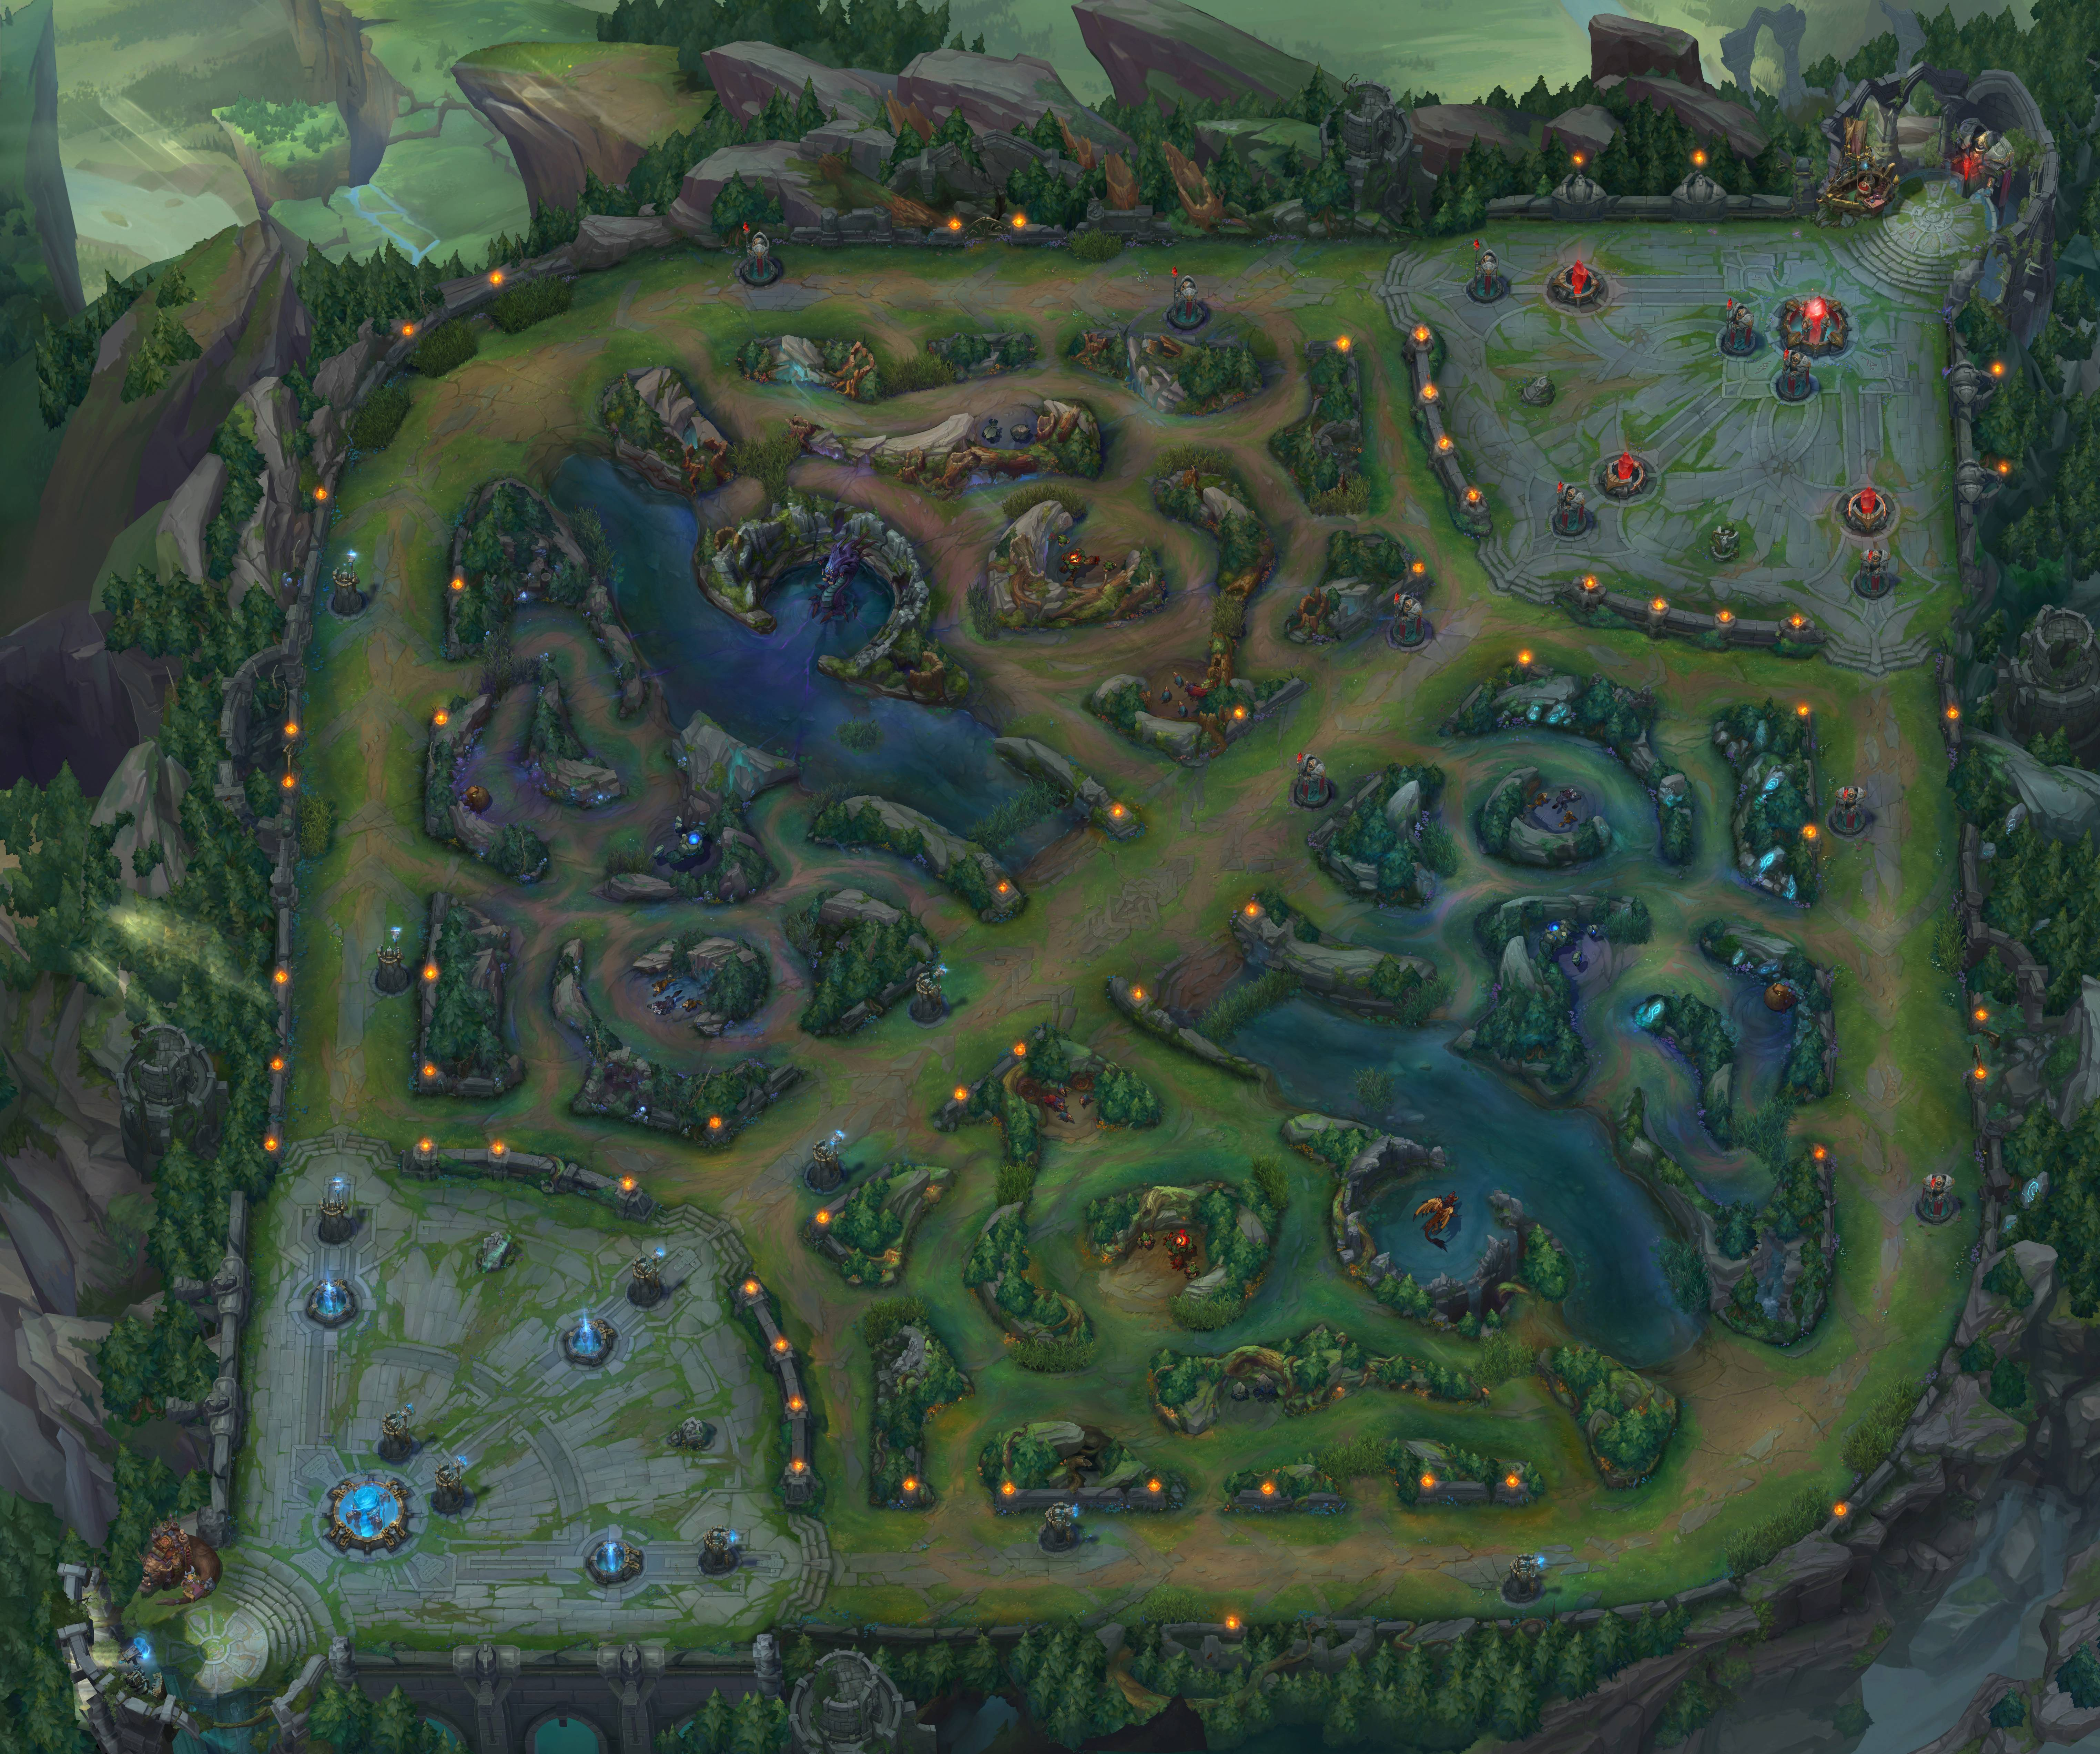 League of Legends Minimap wallpaper